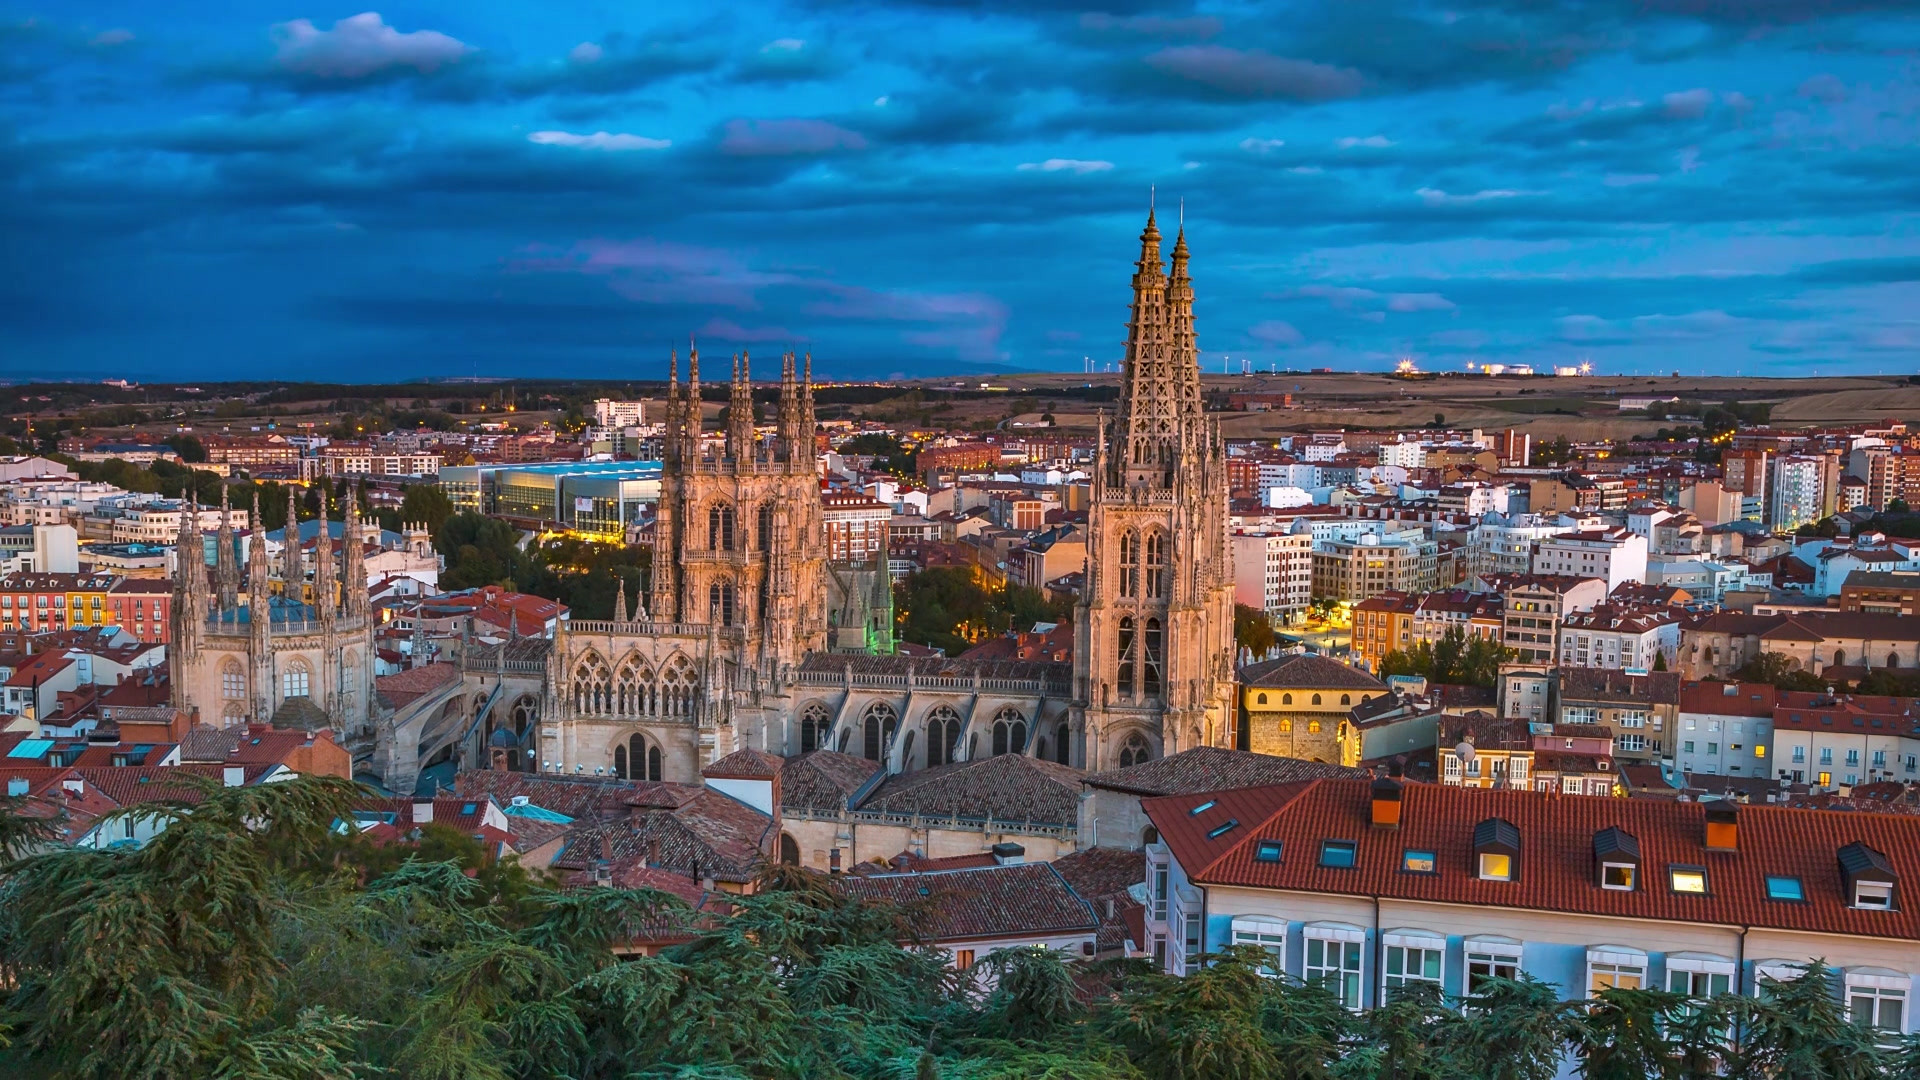 Burgos - September 25, 2020